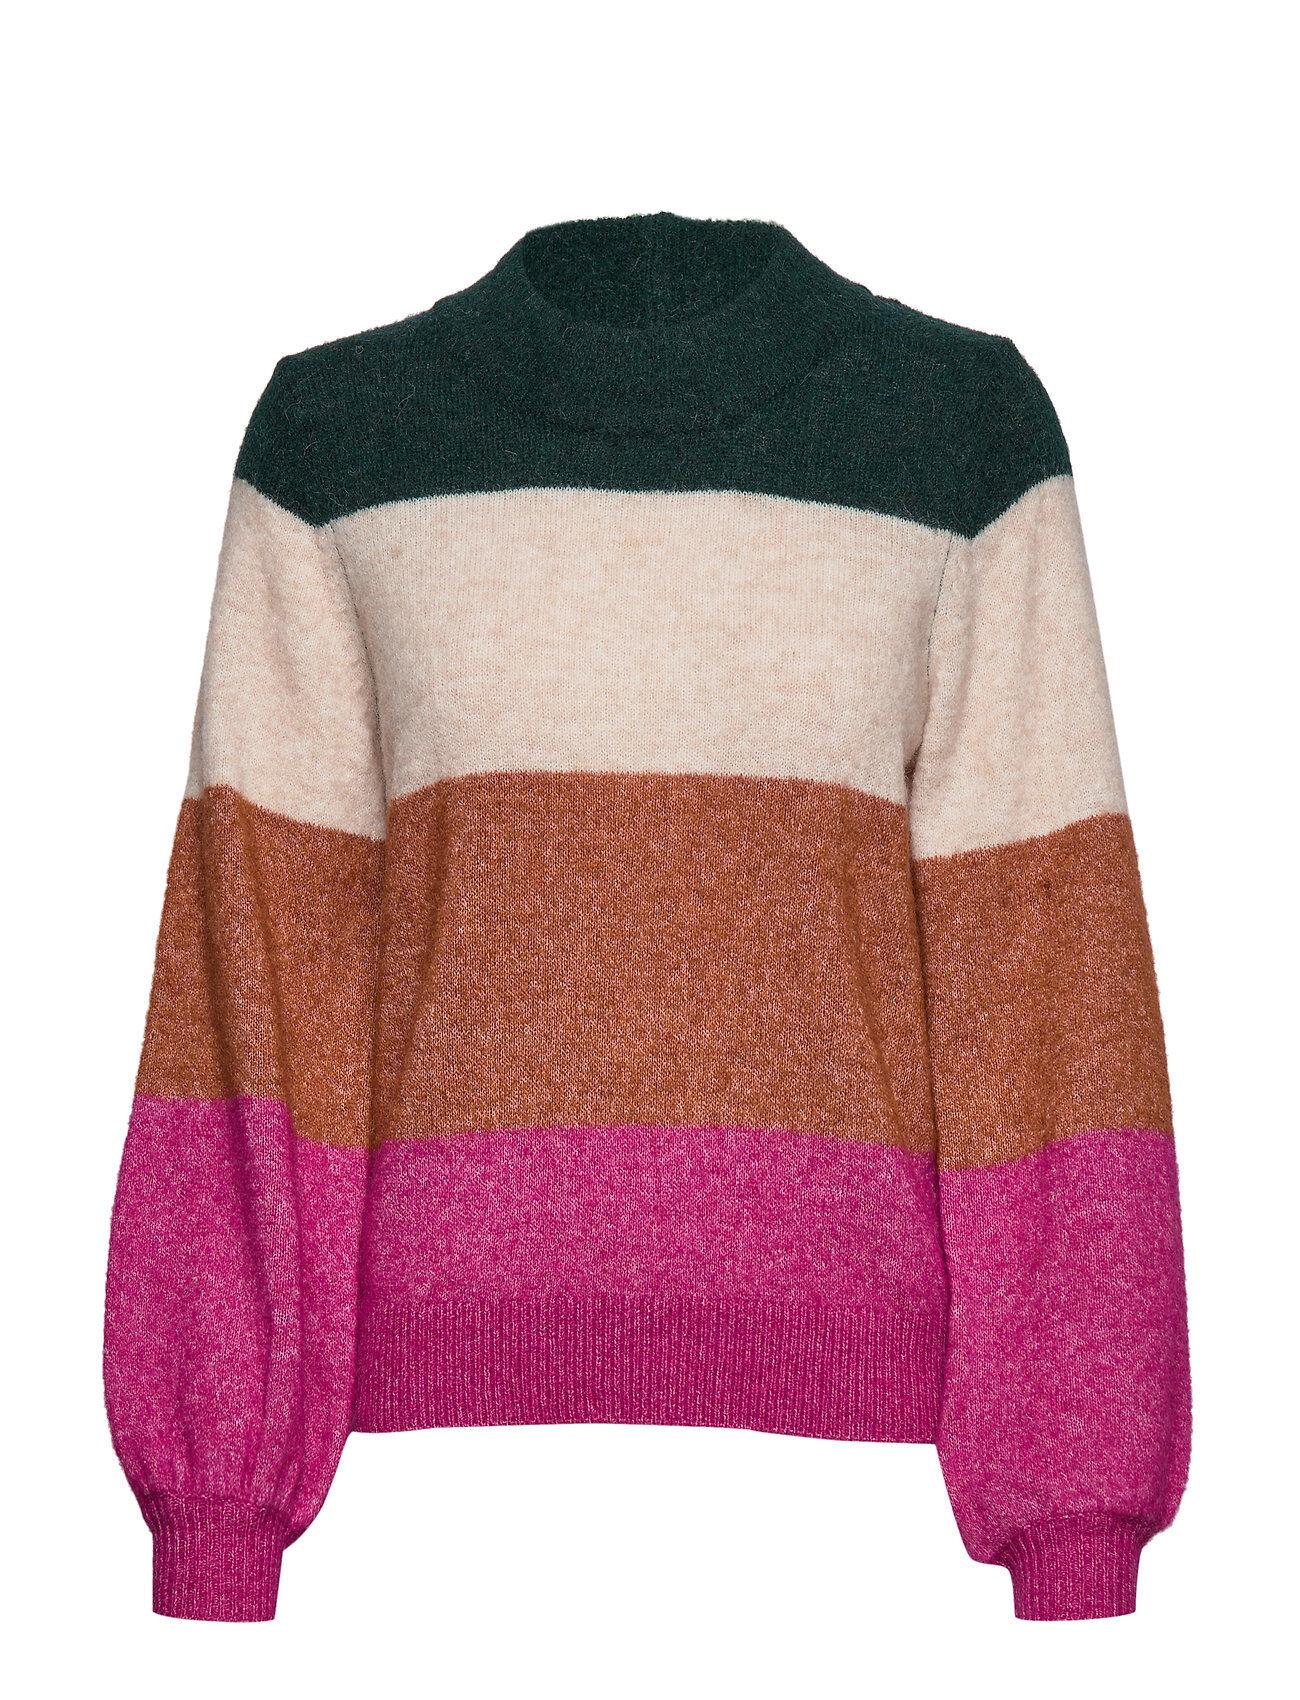 Selected Femme Slfanna Ls X-Mas Knit O-Neck B Kilpikonnakaulus Poolopaita Vaaleanpunainen Selected Femme